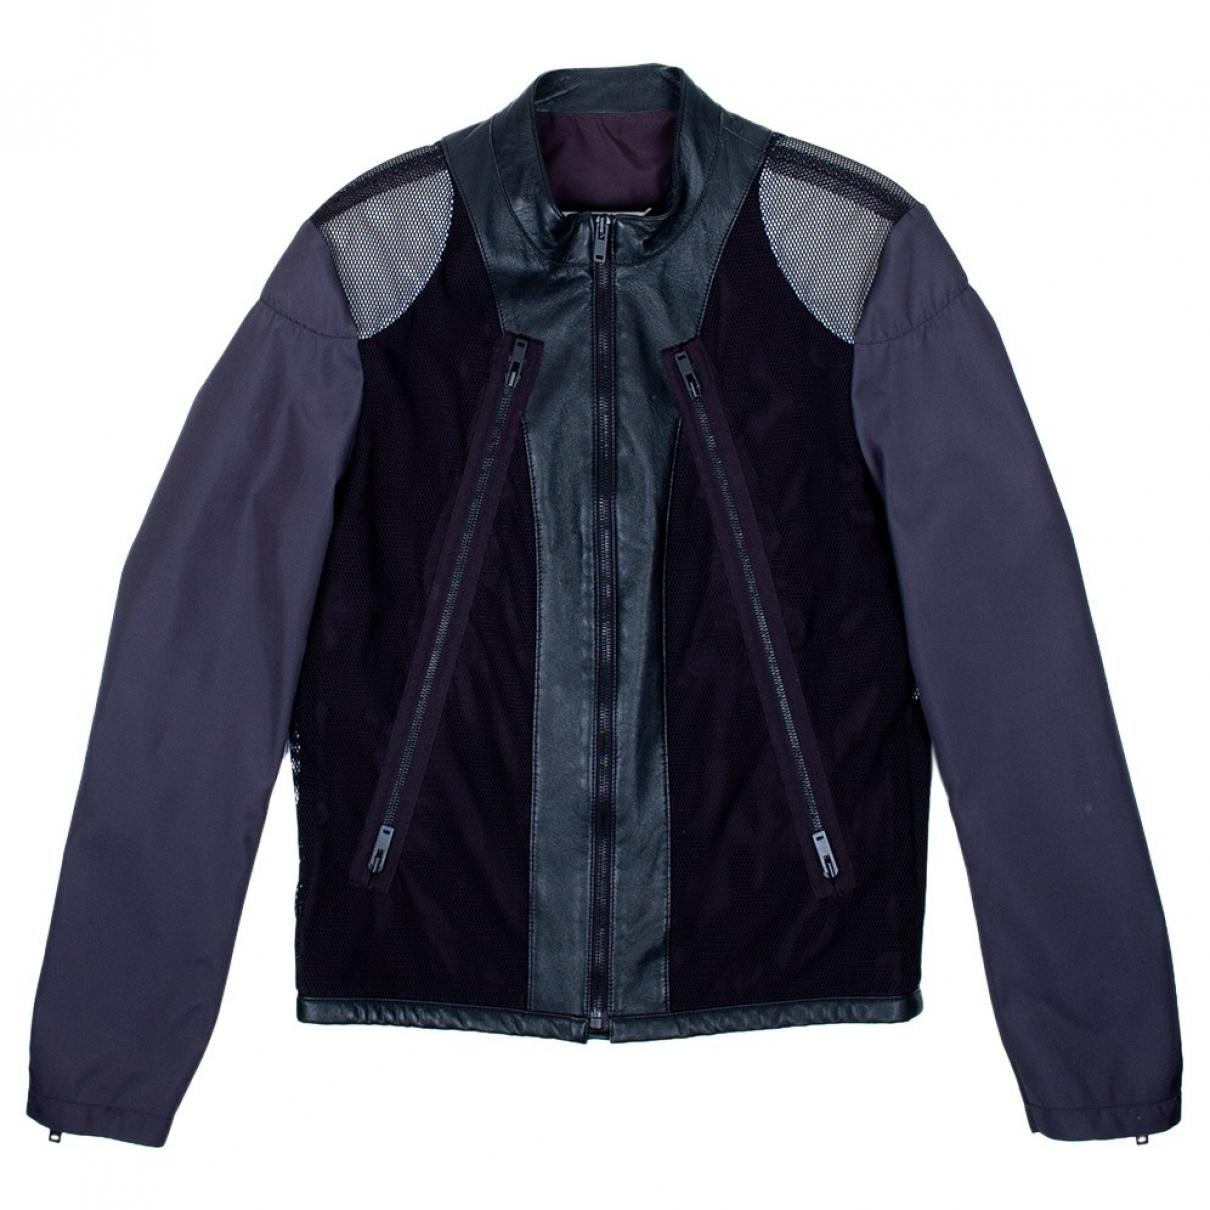 Maison Martin Margiela \N Black Cotton jacket  for Men 48 IT